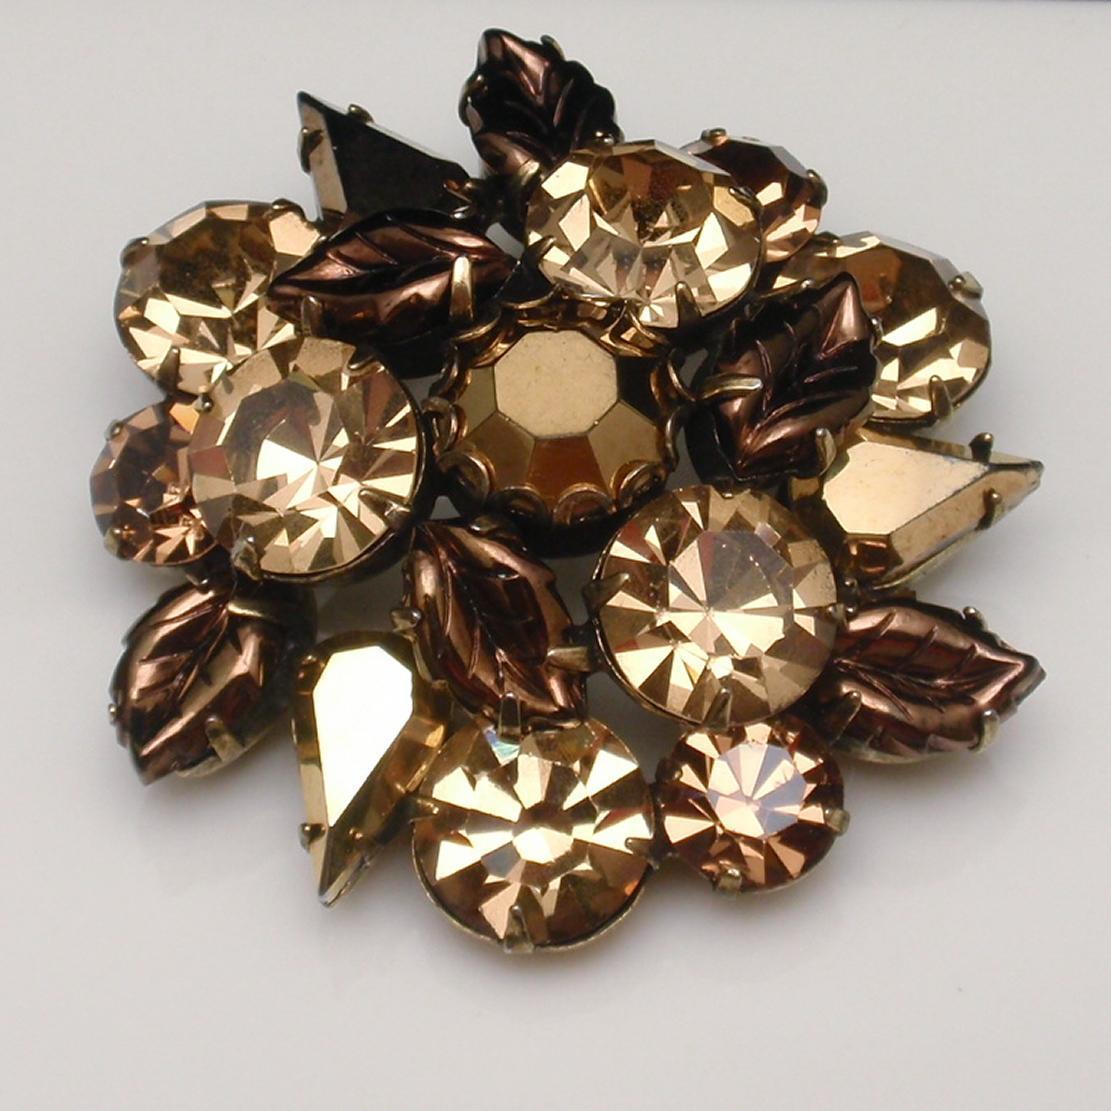 Regency Rhinestone Brooch Pin Vintage Bronze Tone Quality Stones